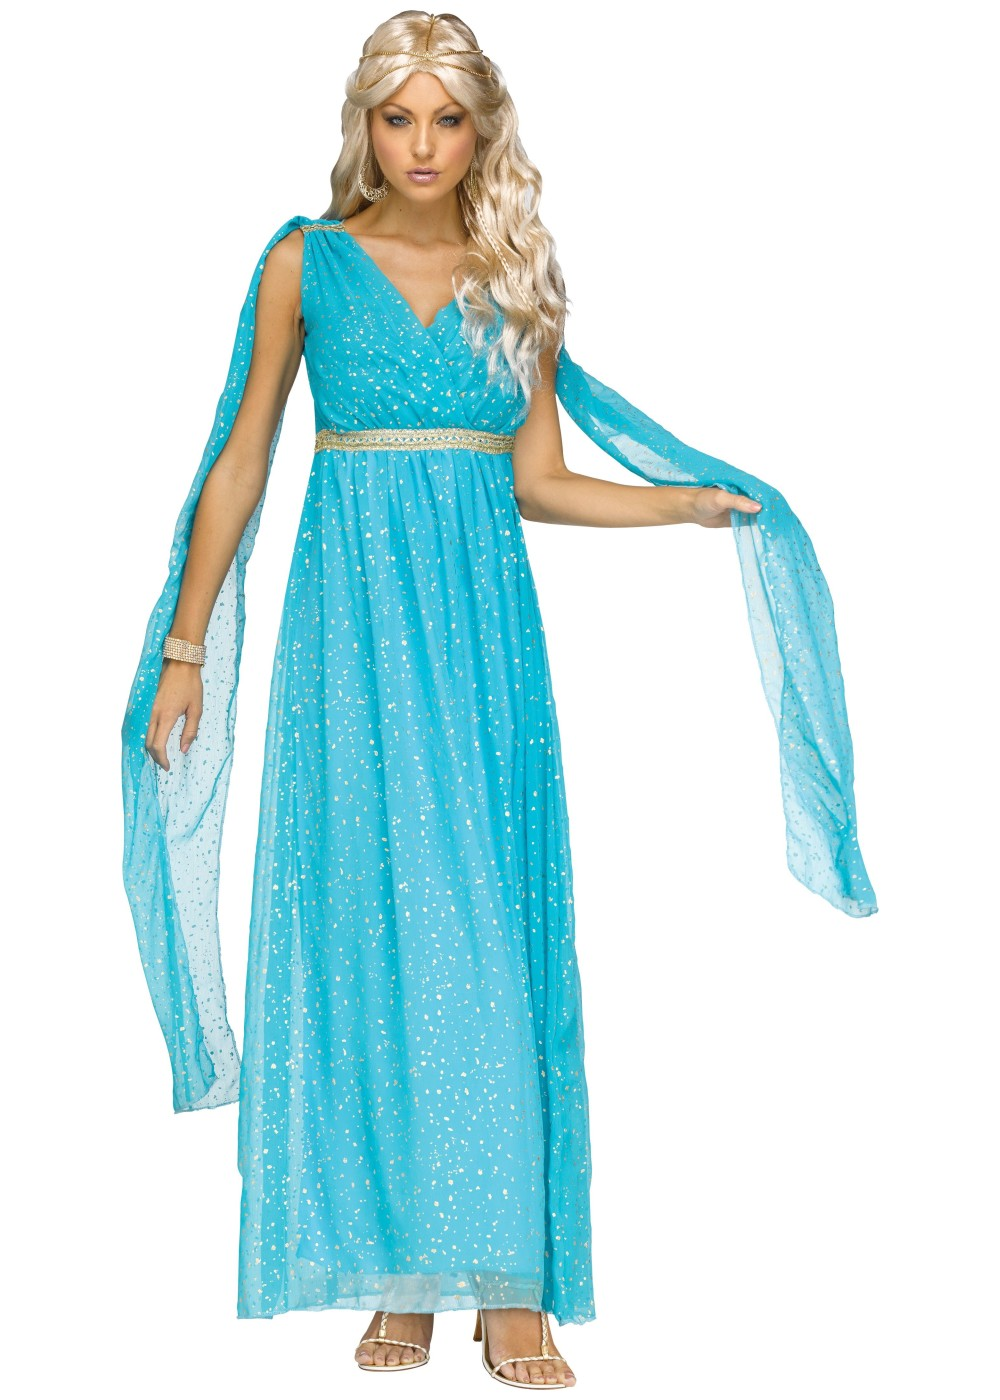 Divine Goddess Women Costume - Greek Costumes